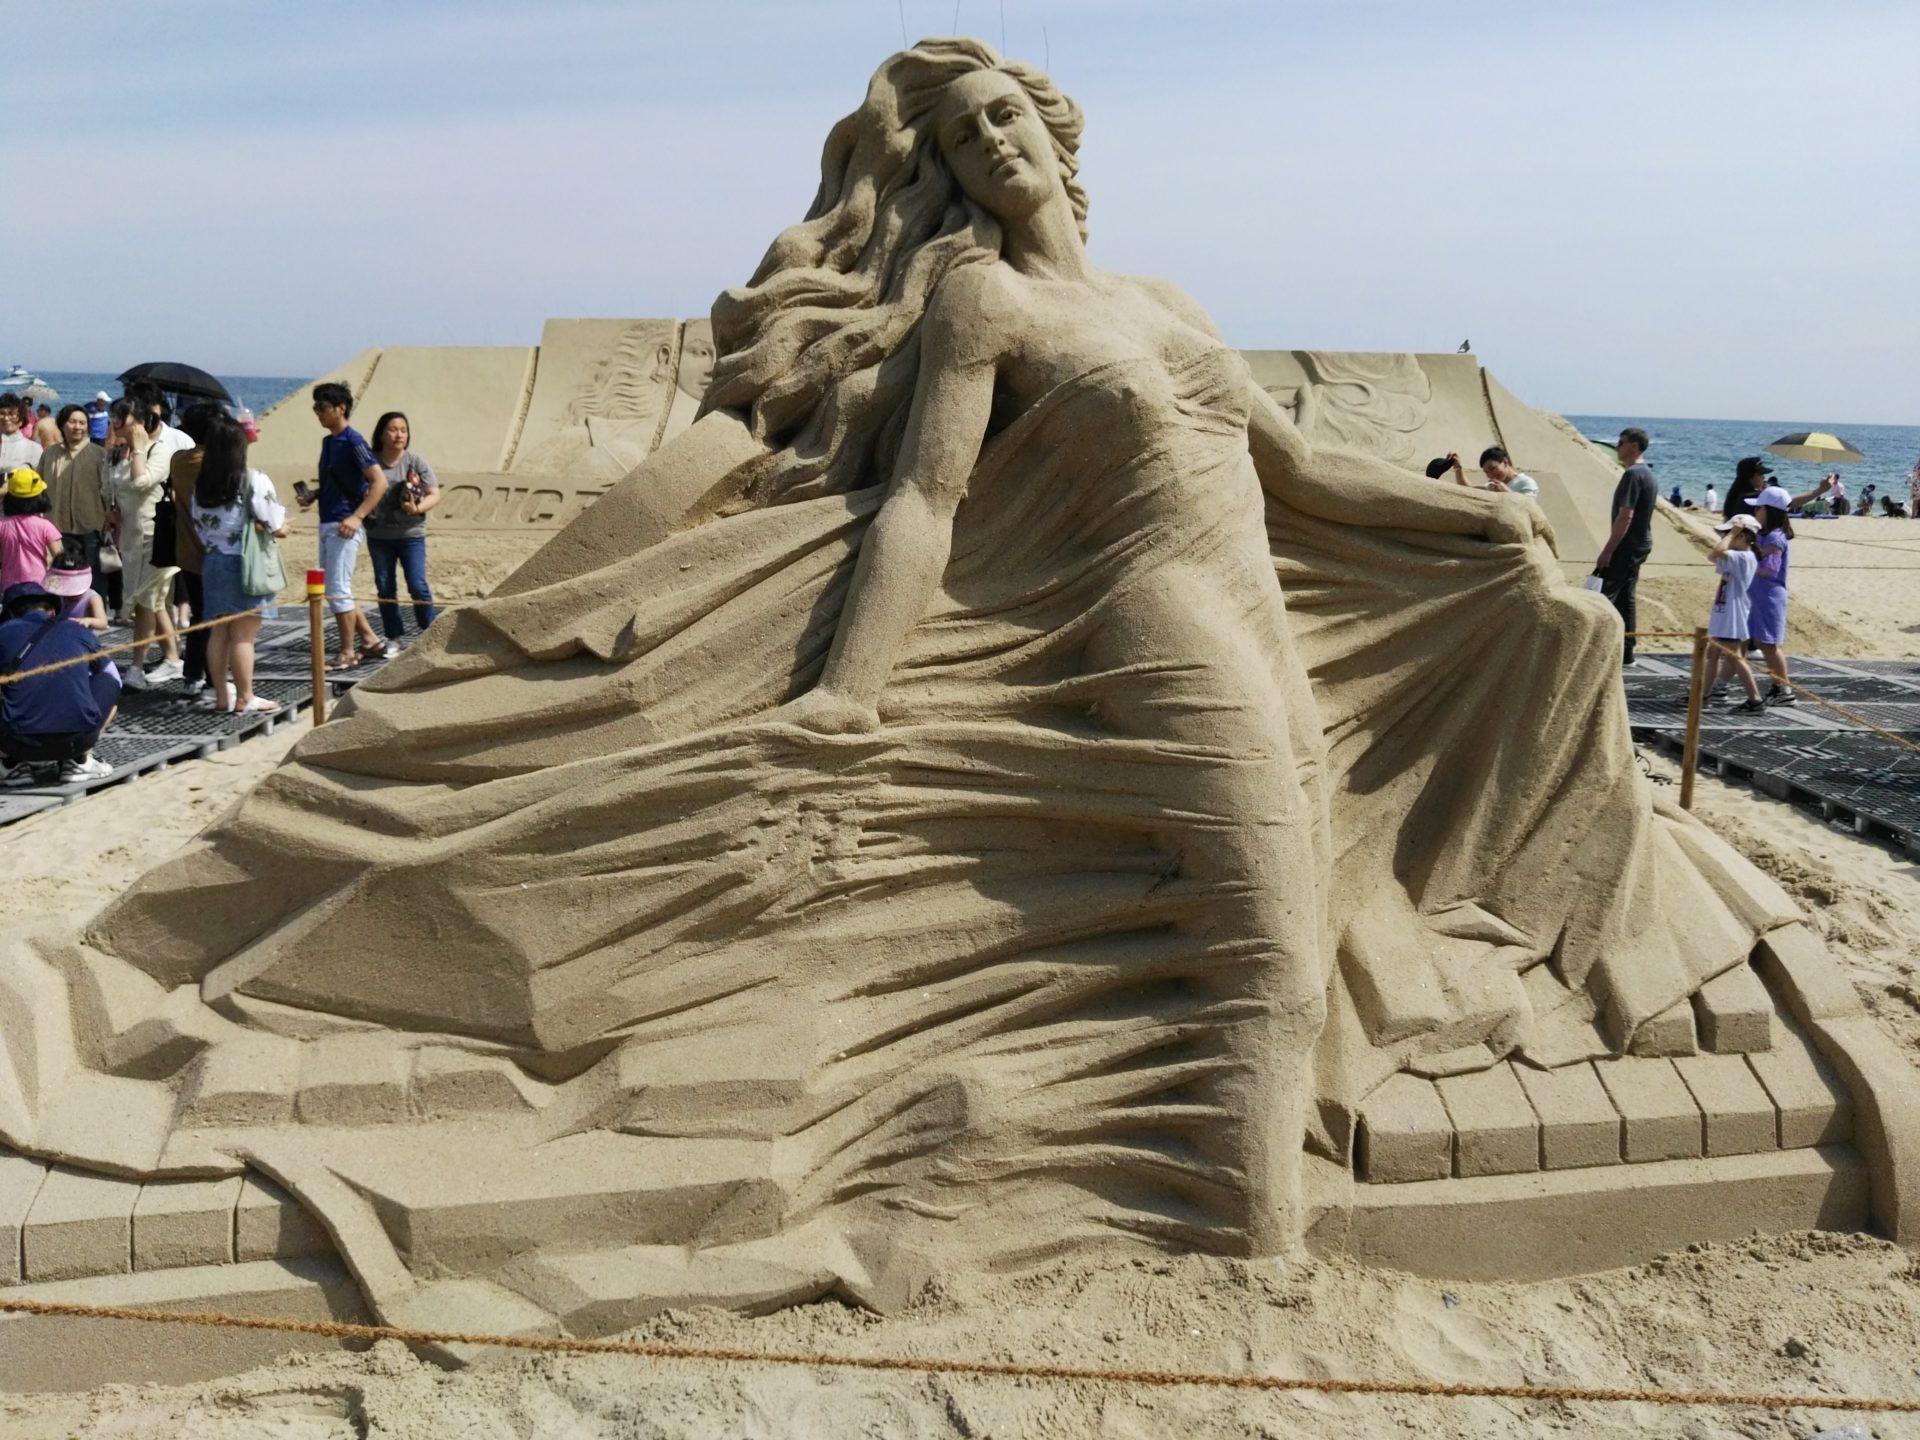 Scultura di sabbia durante l'Haeundae Sand Festival